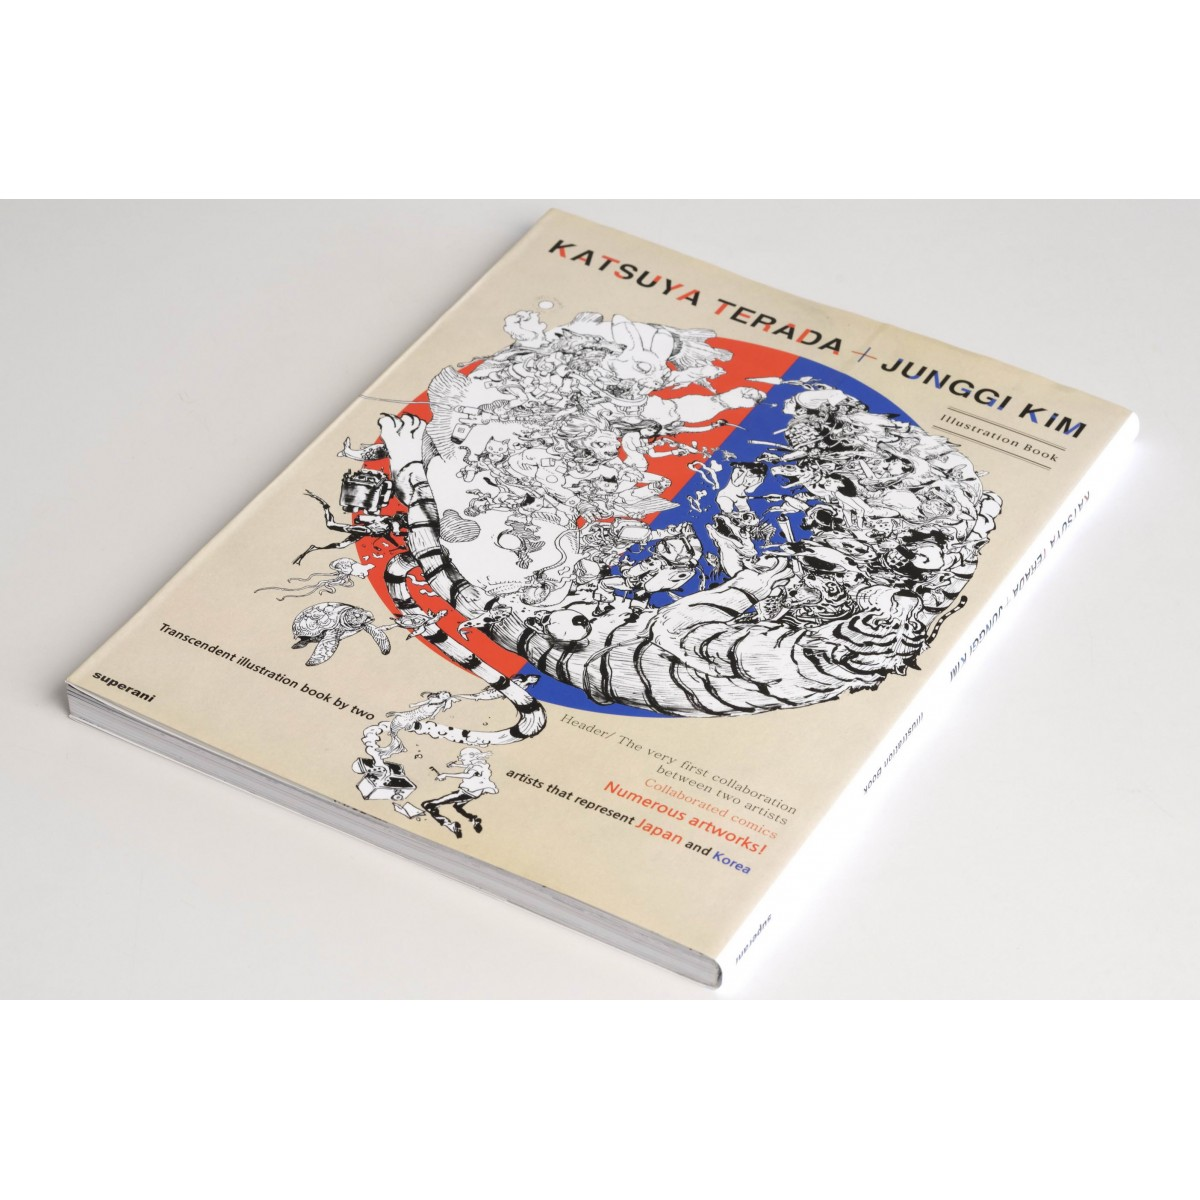 Terada Katsuya + Kim Jung Gi Illustration Book [English Version]